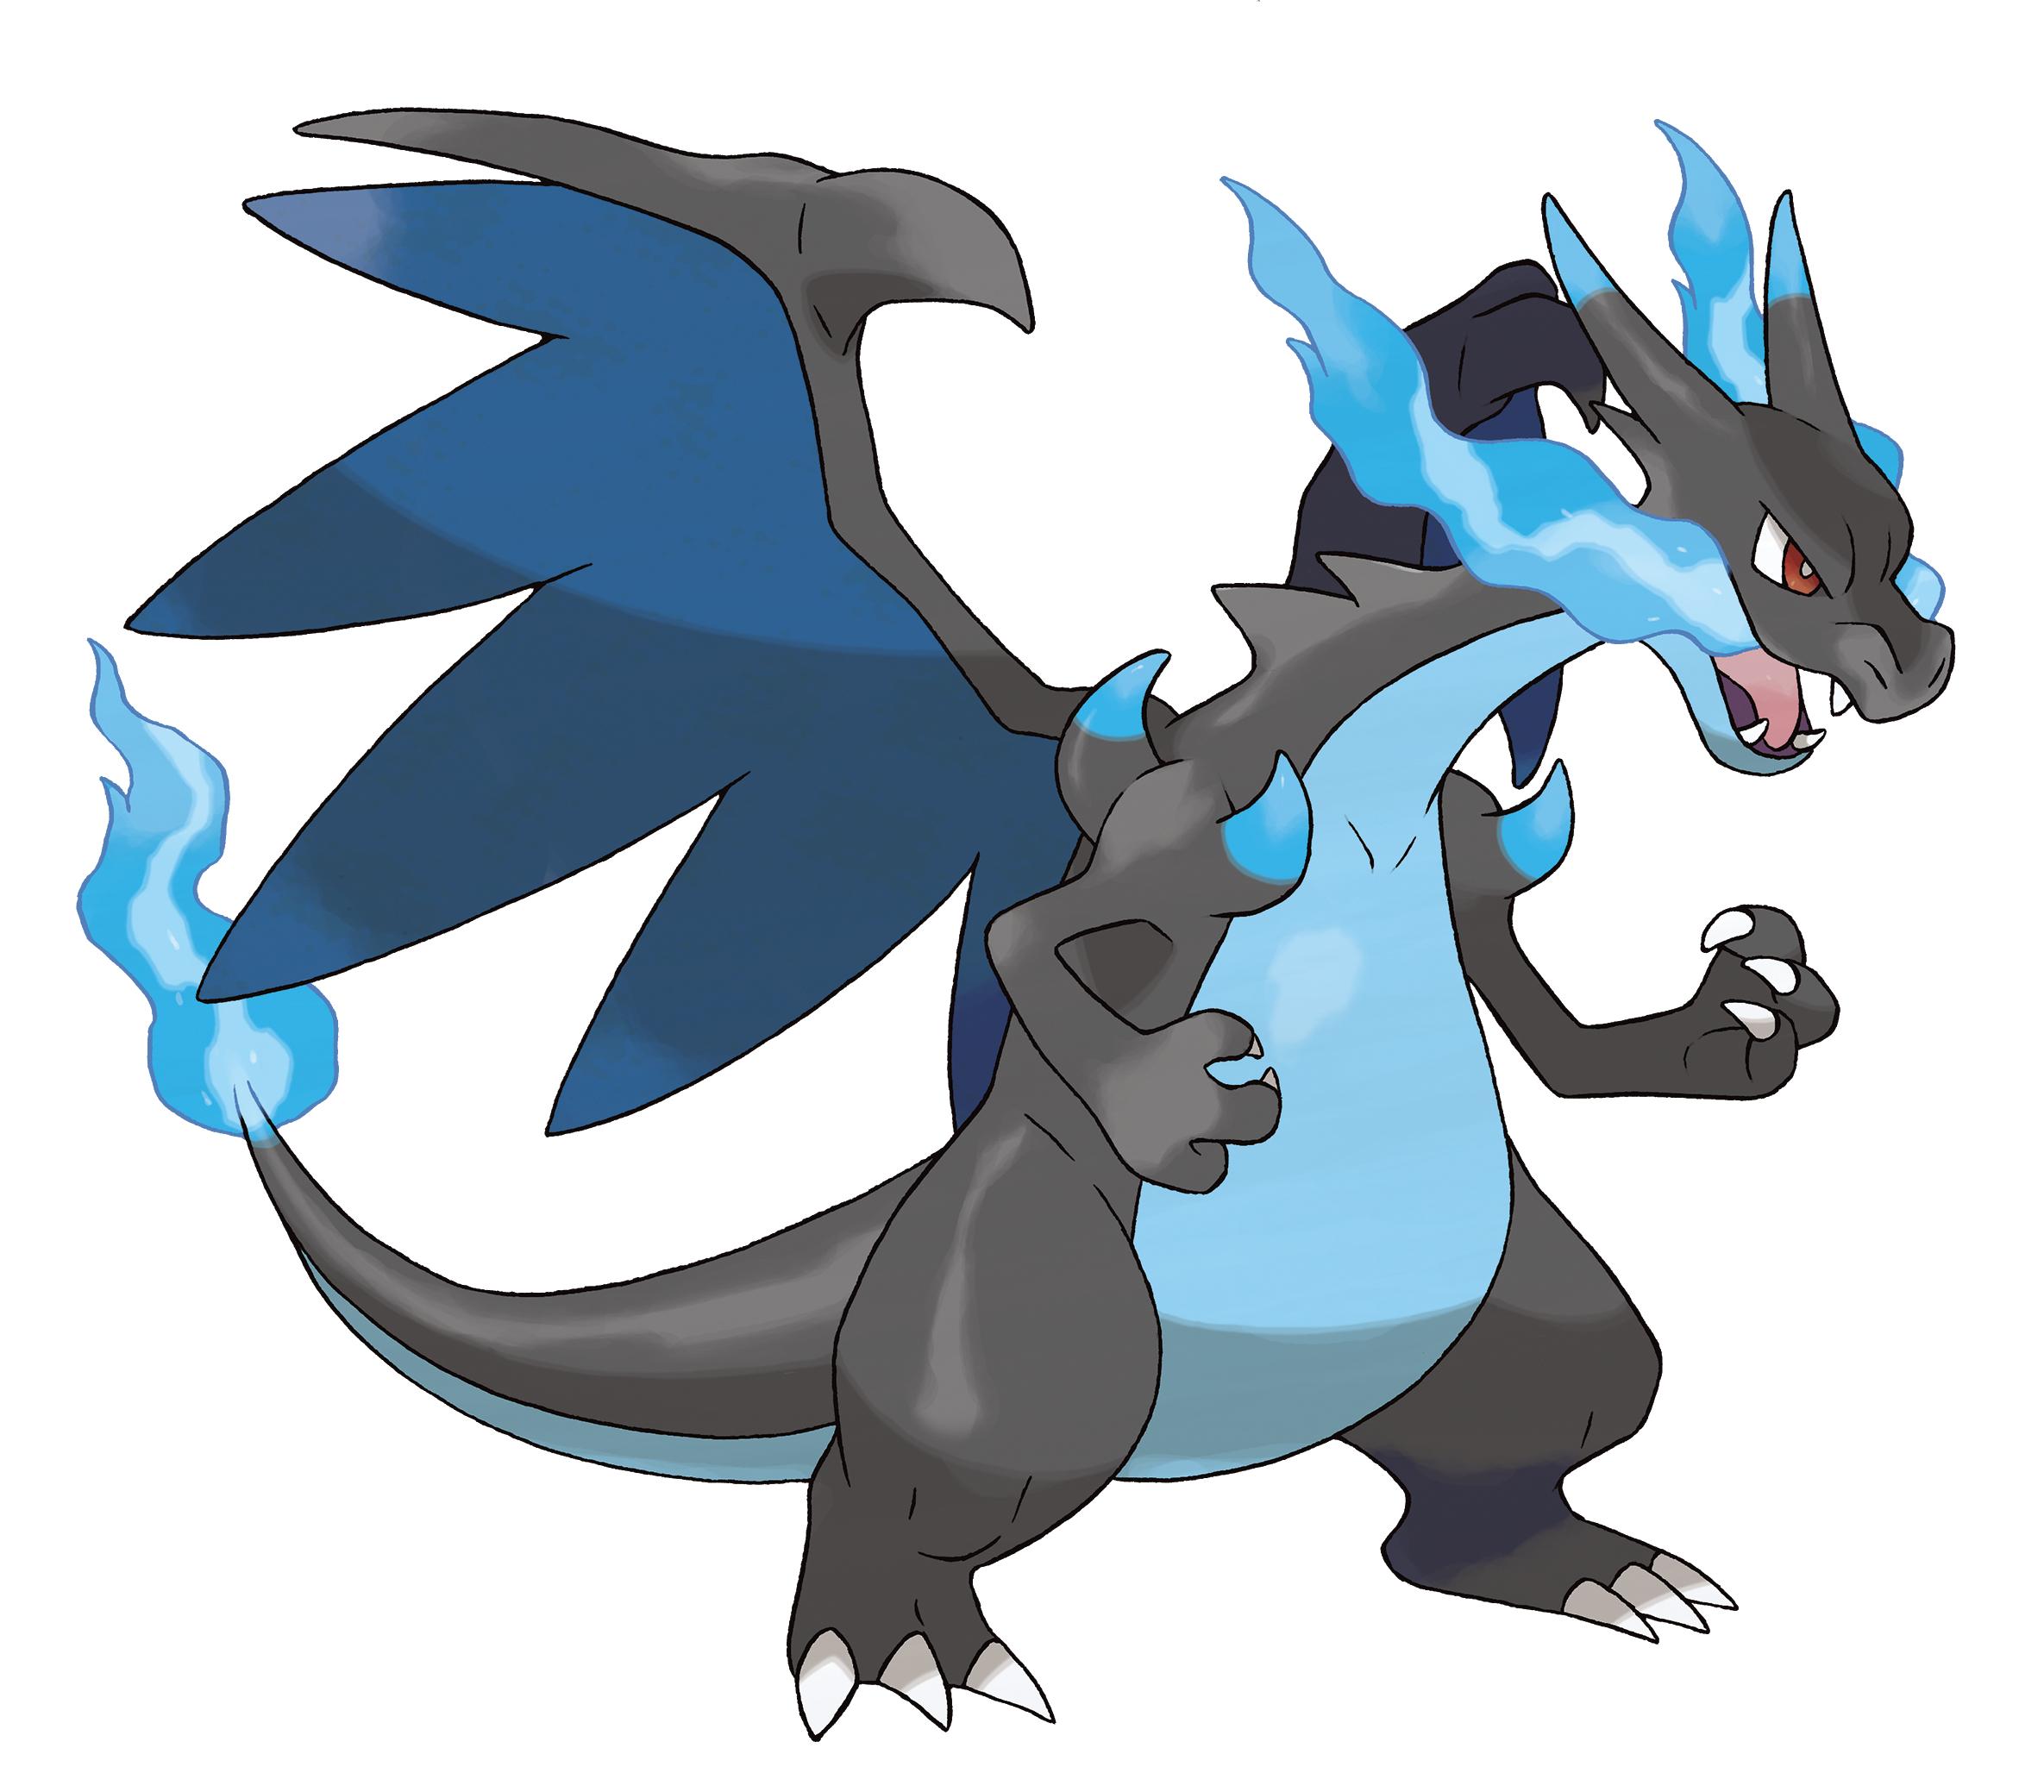 Clipart dragon drogon. Mega charizard x evolution